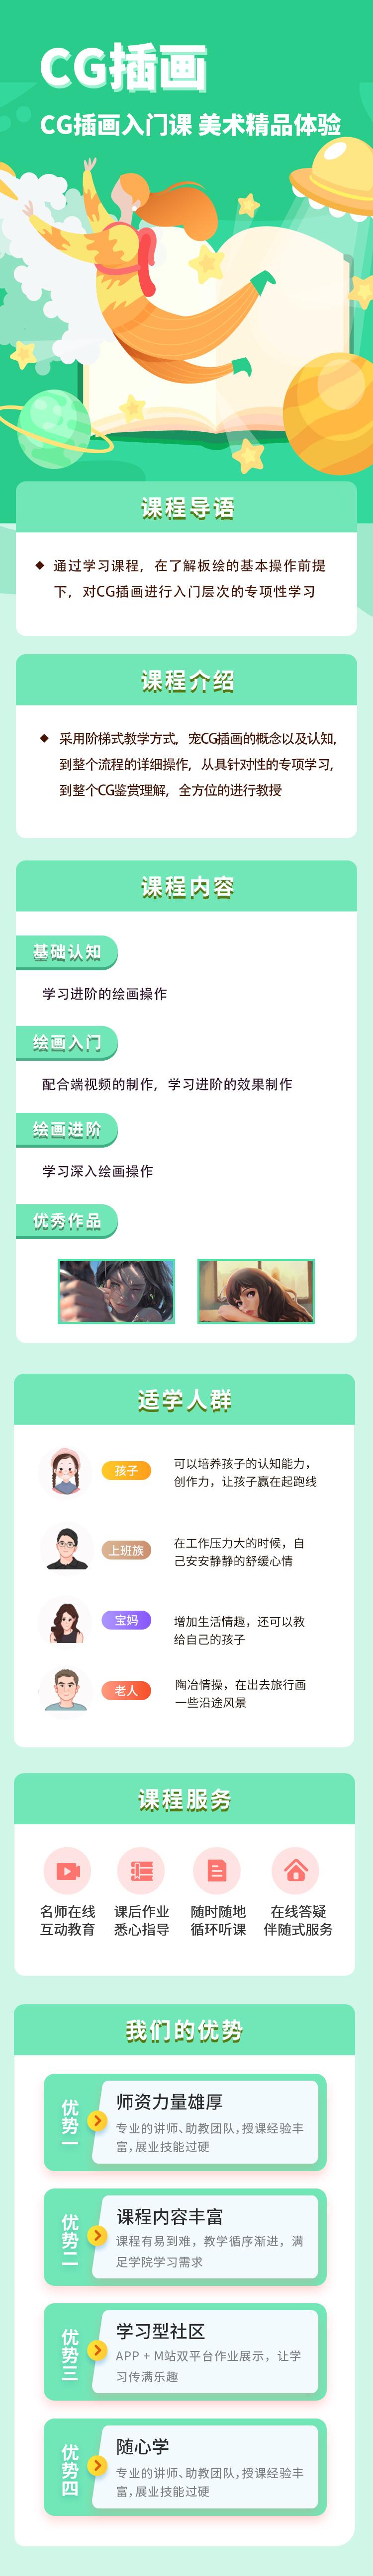 CG插画详情.png.jpg